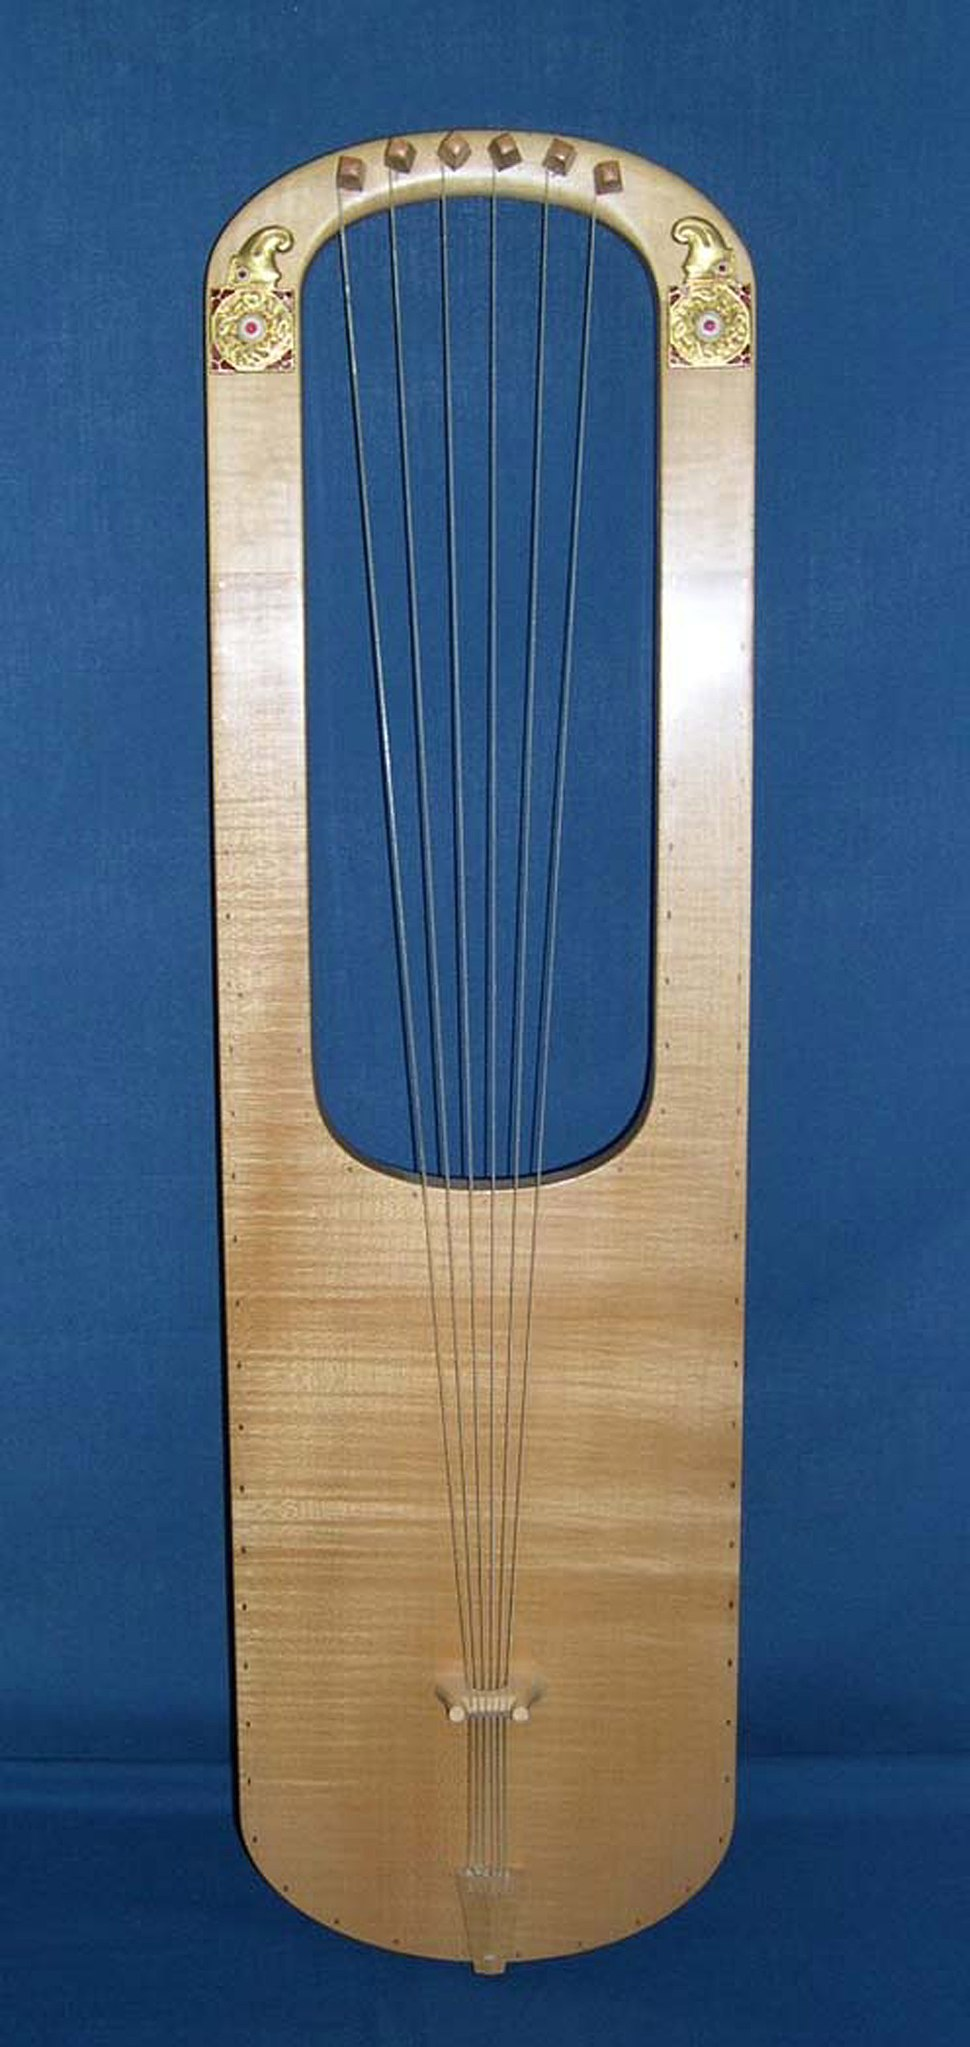 Sutton Hoo lyre (reconstruction)